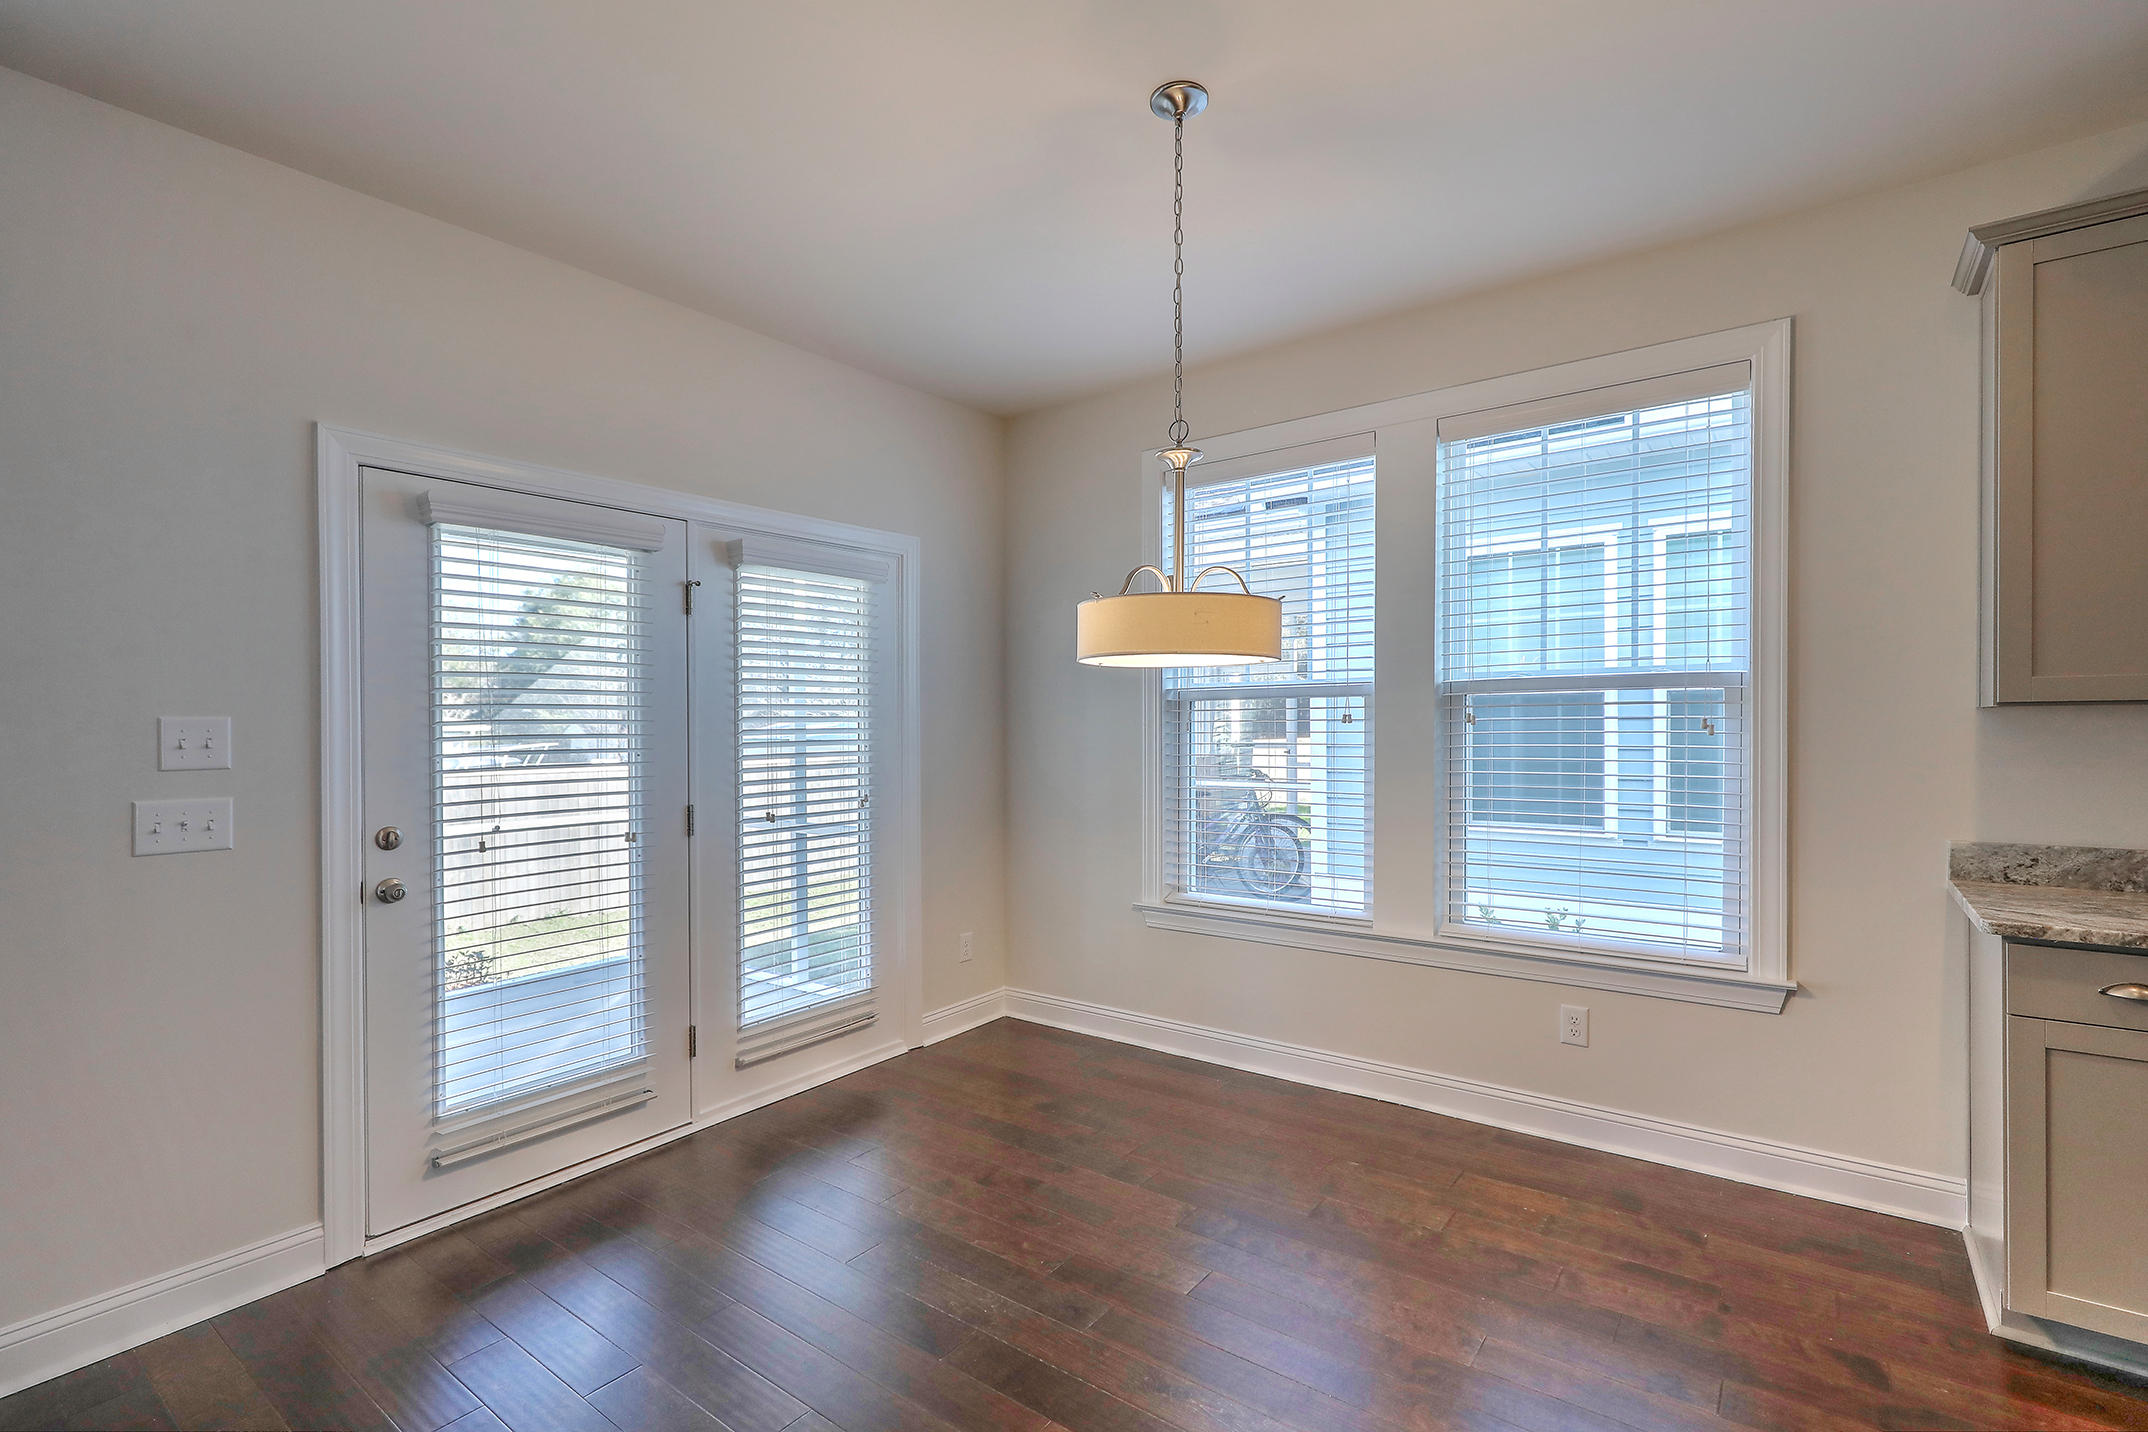 Bentley Park Homes For Sale - 1281 Gannett, Mount Pleasant, SC - 3